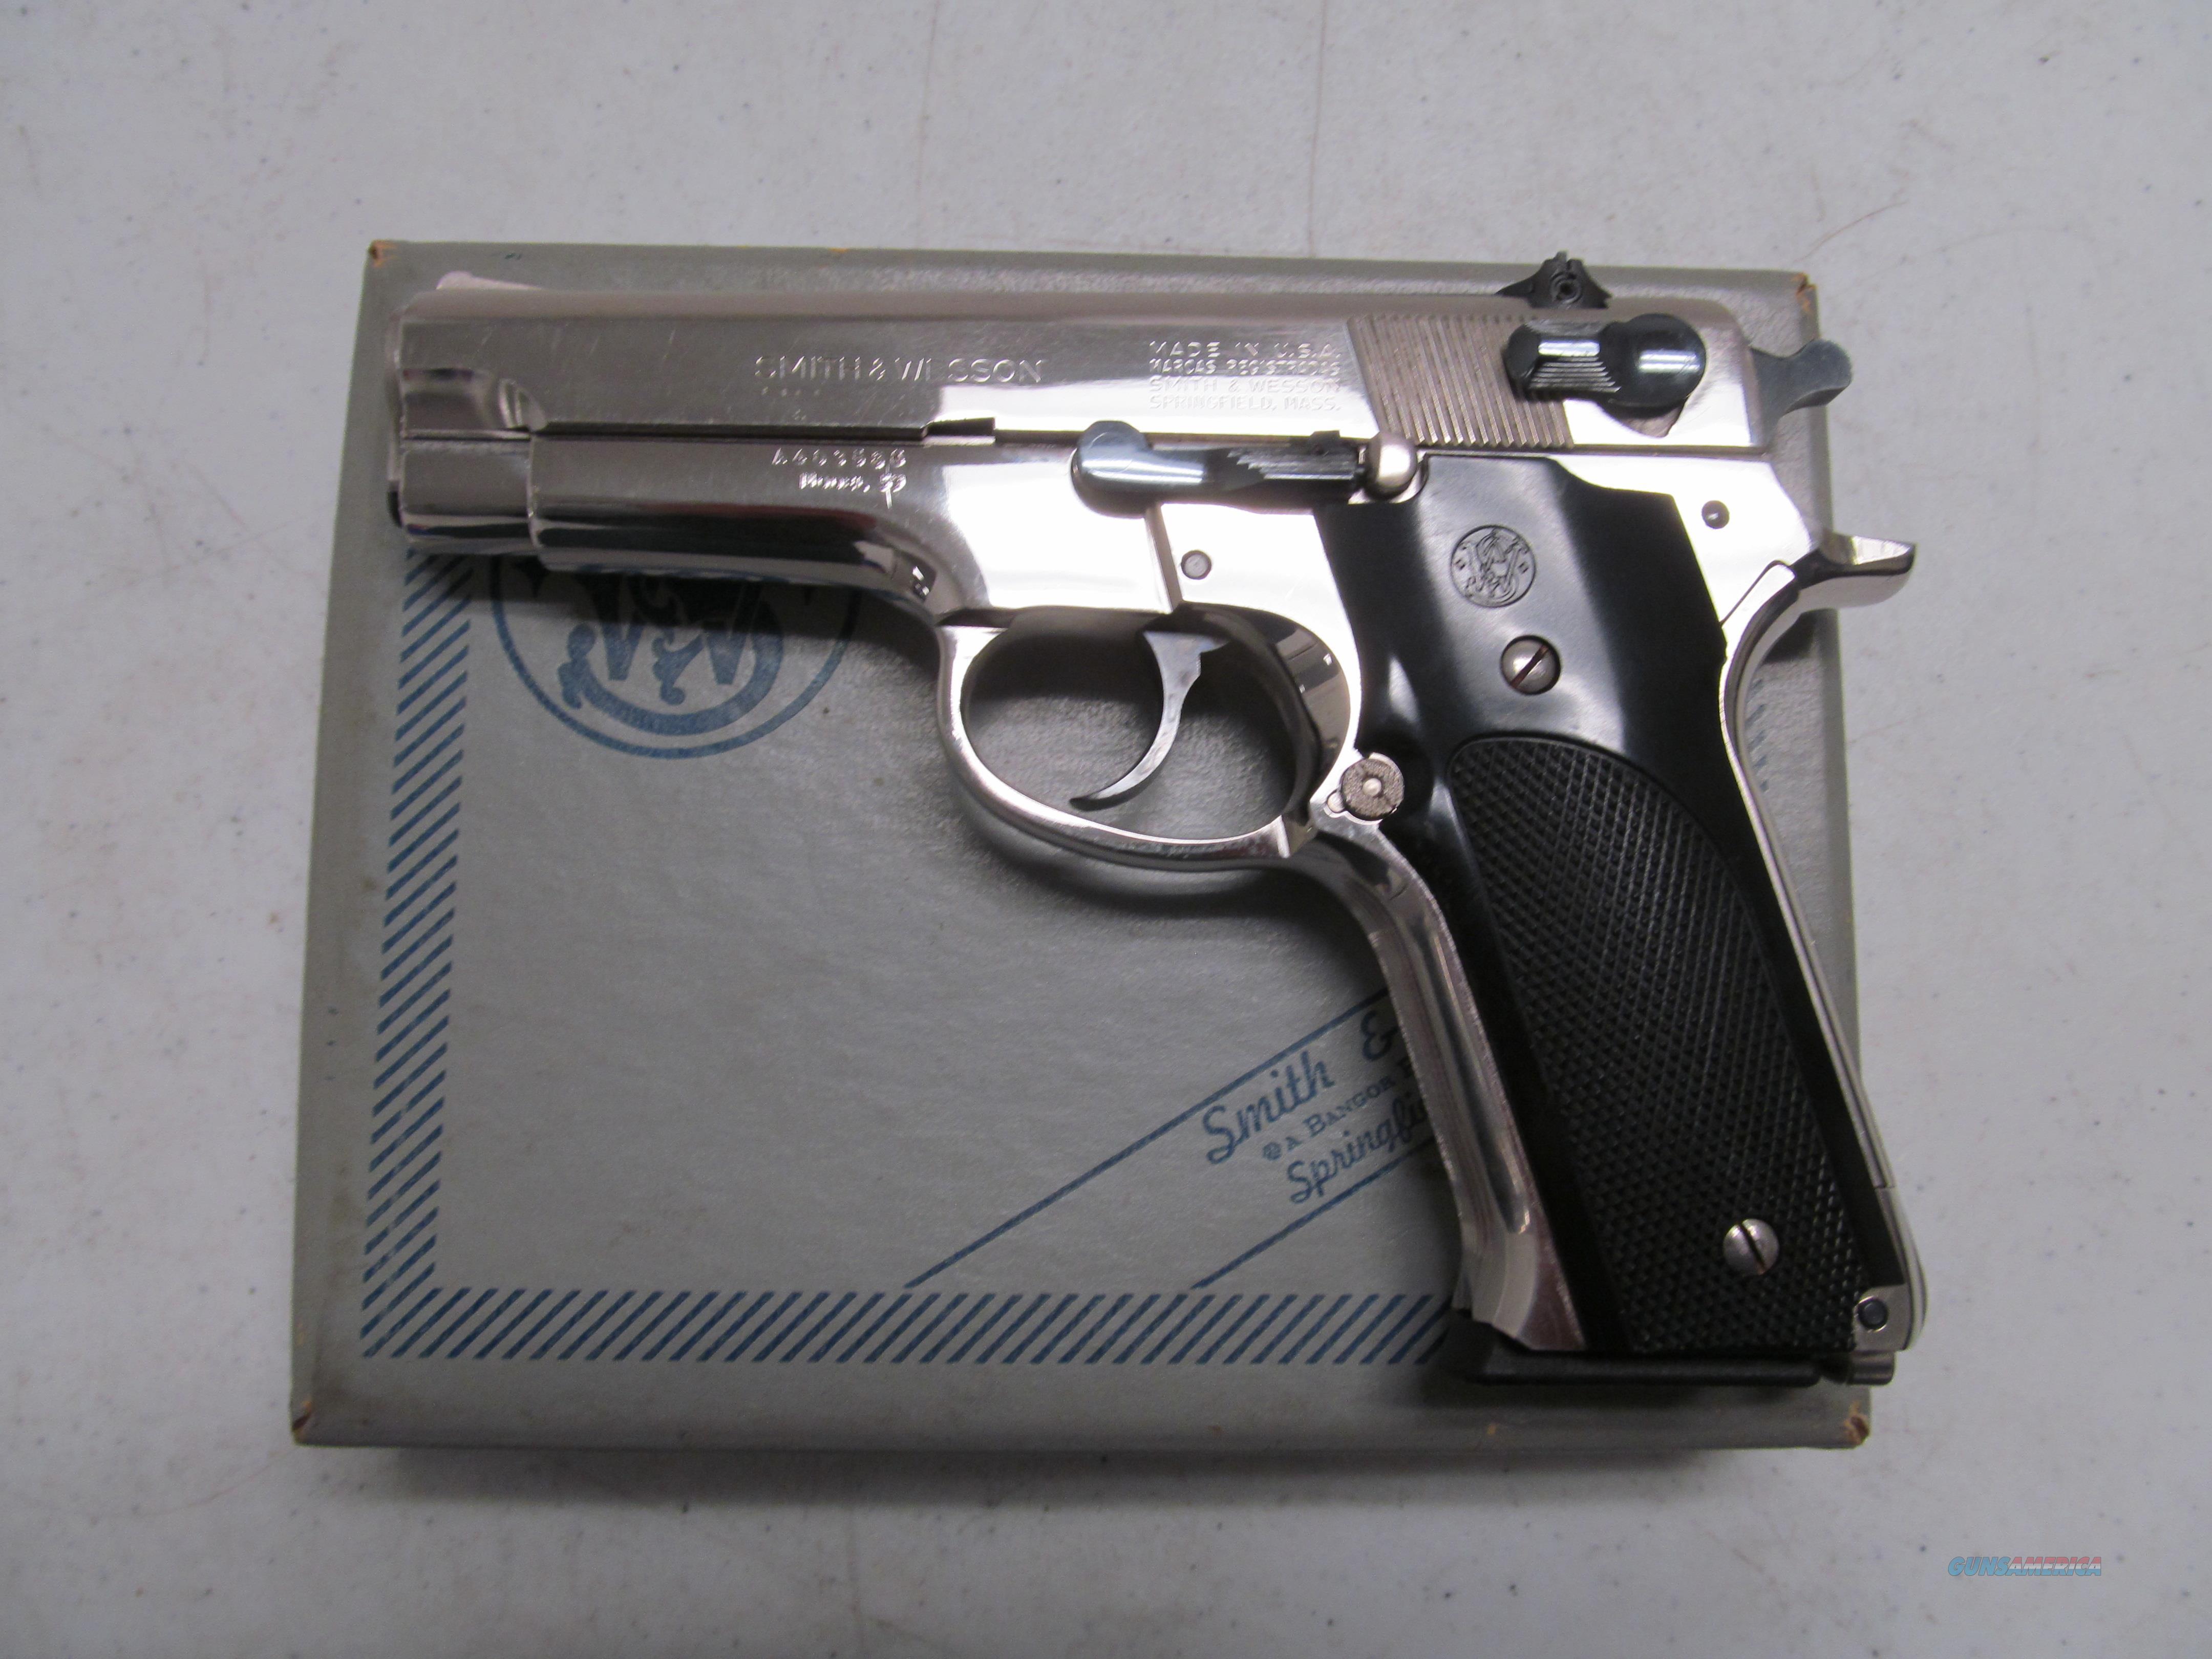 Smith & Wesson Model 59, Original Nickel, Box  Guns > Pistols > Smith & Wesson Pistols - Autos > Steel Frame